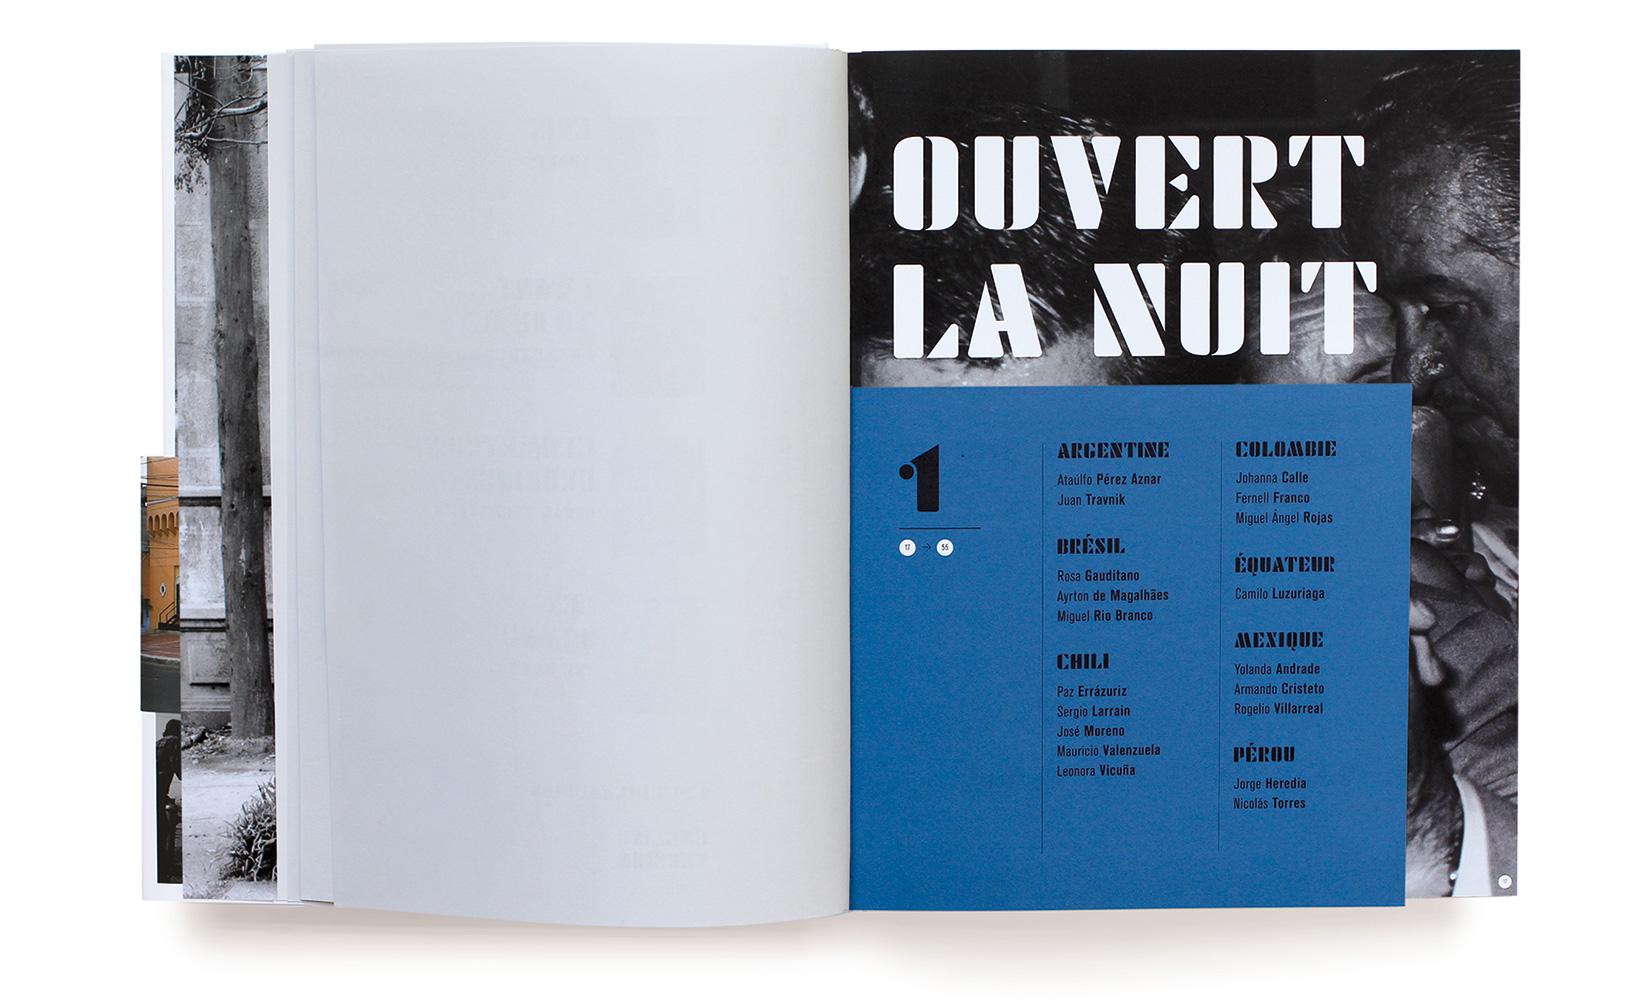 olivier-andreotti-pulsions-urbaines-05.jpg